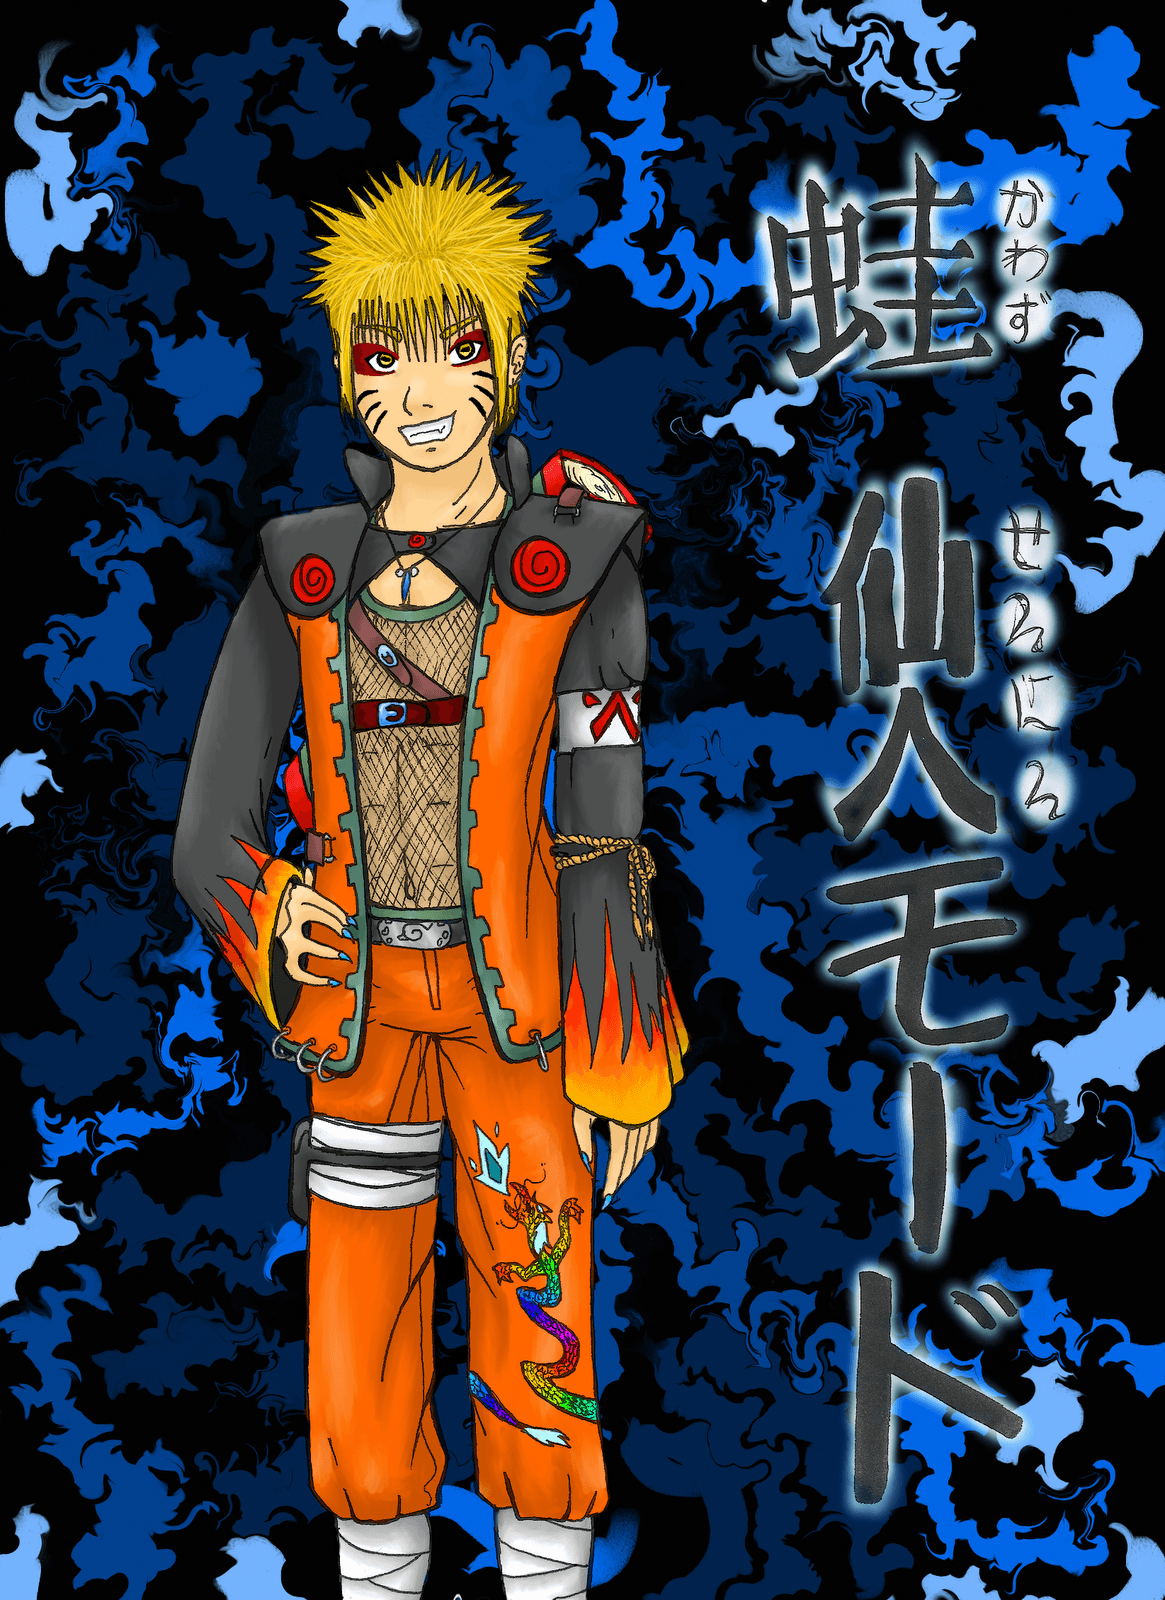 Uzumaki Naruto Sage Mode Wallpapers HD - Wallpaper Cave